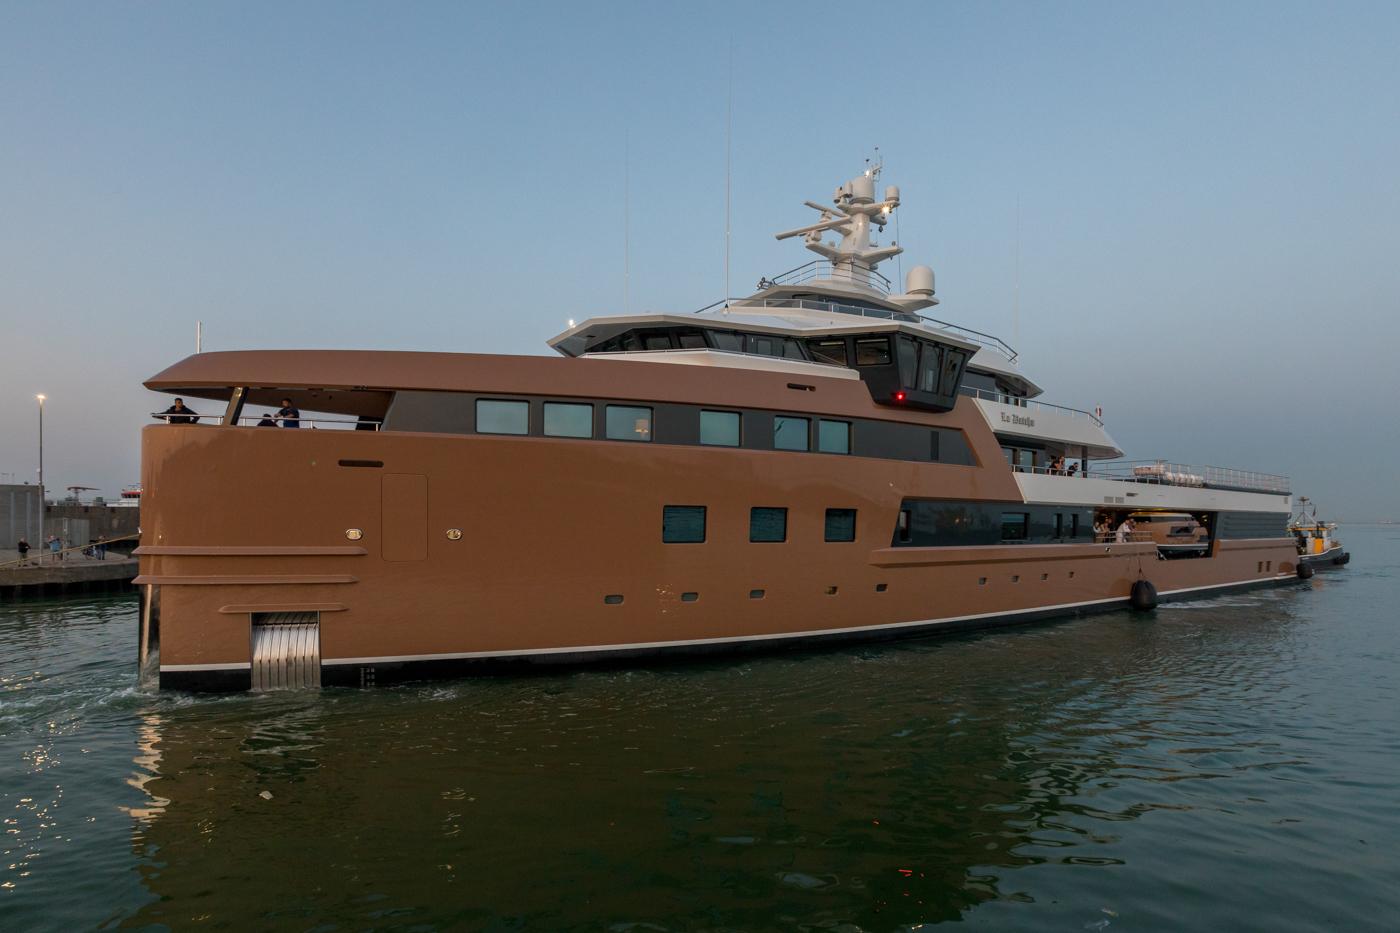 Yacht-La-Datcha-77-Heliski-Russia-5